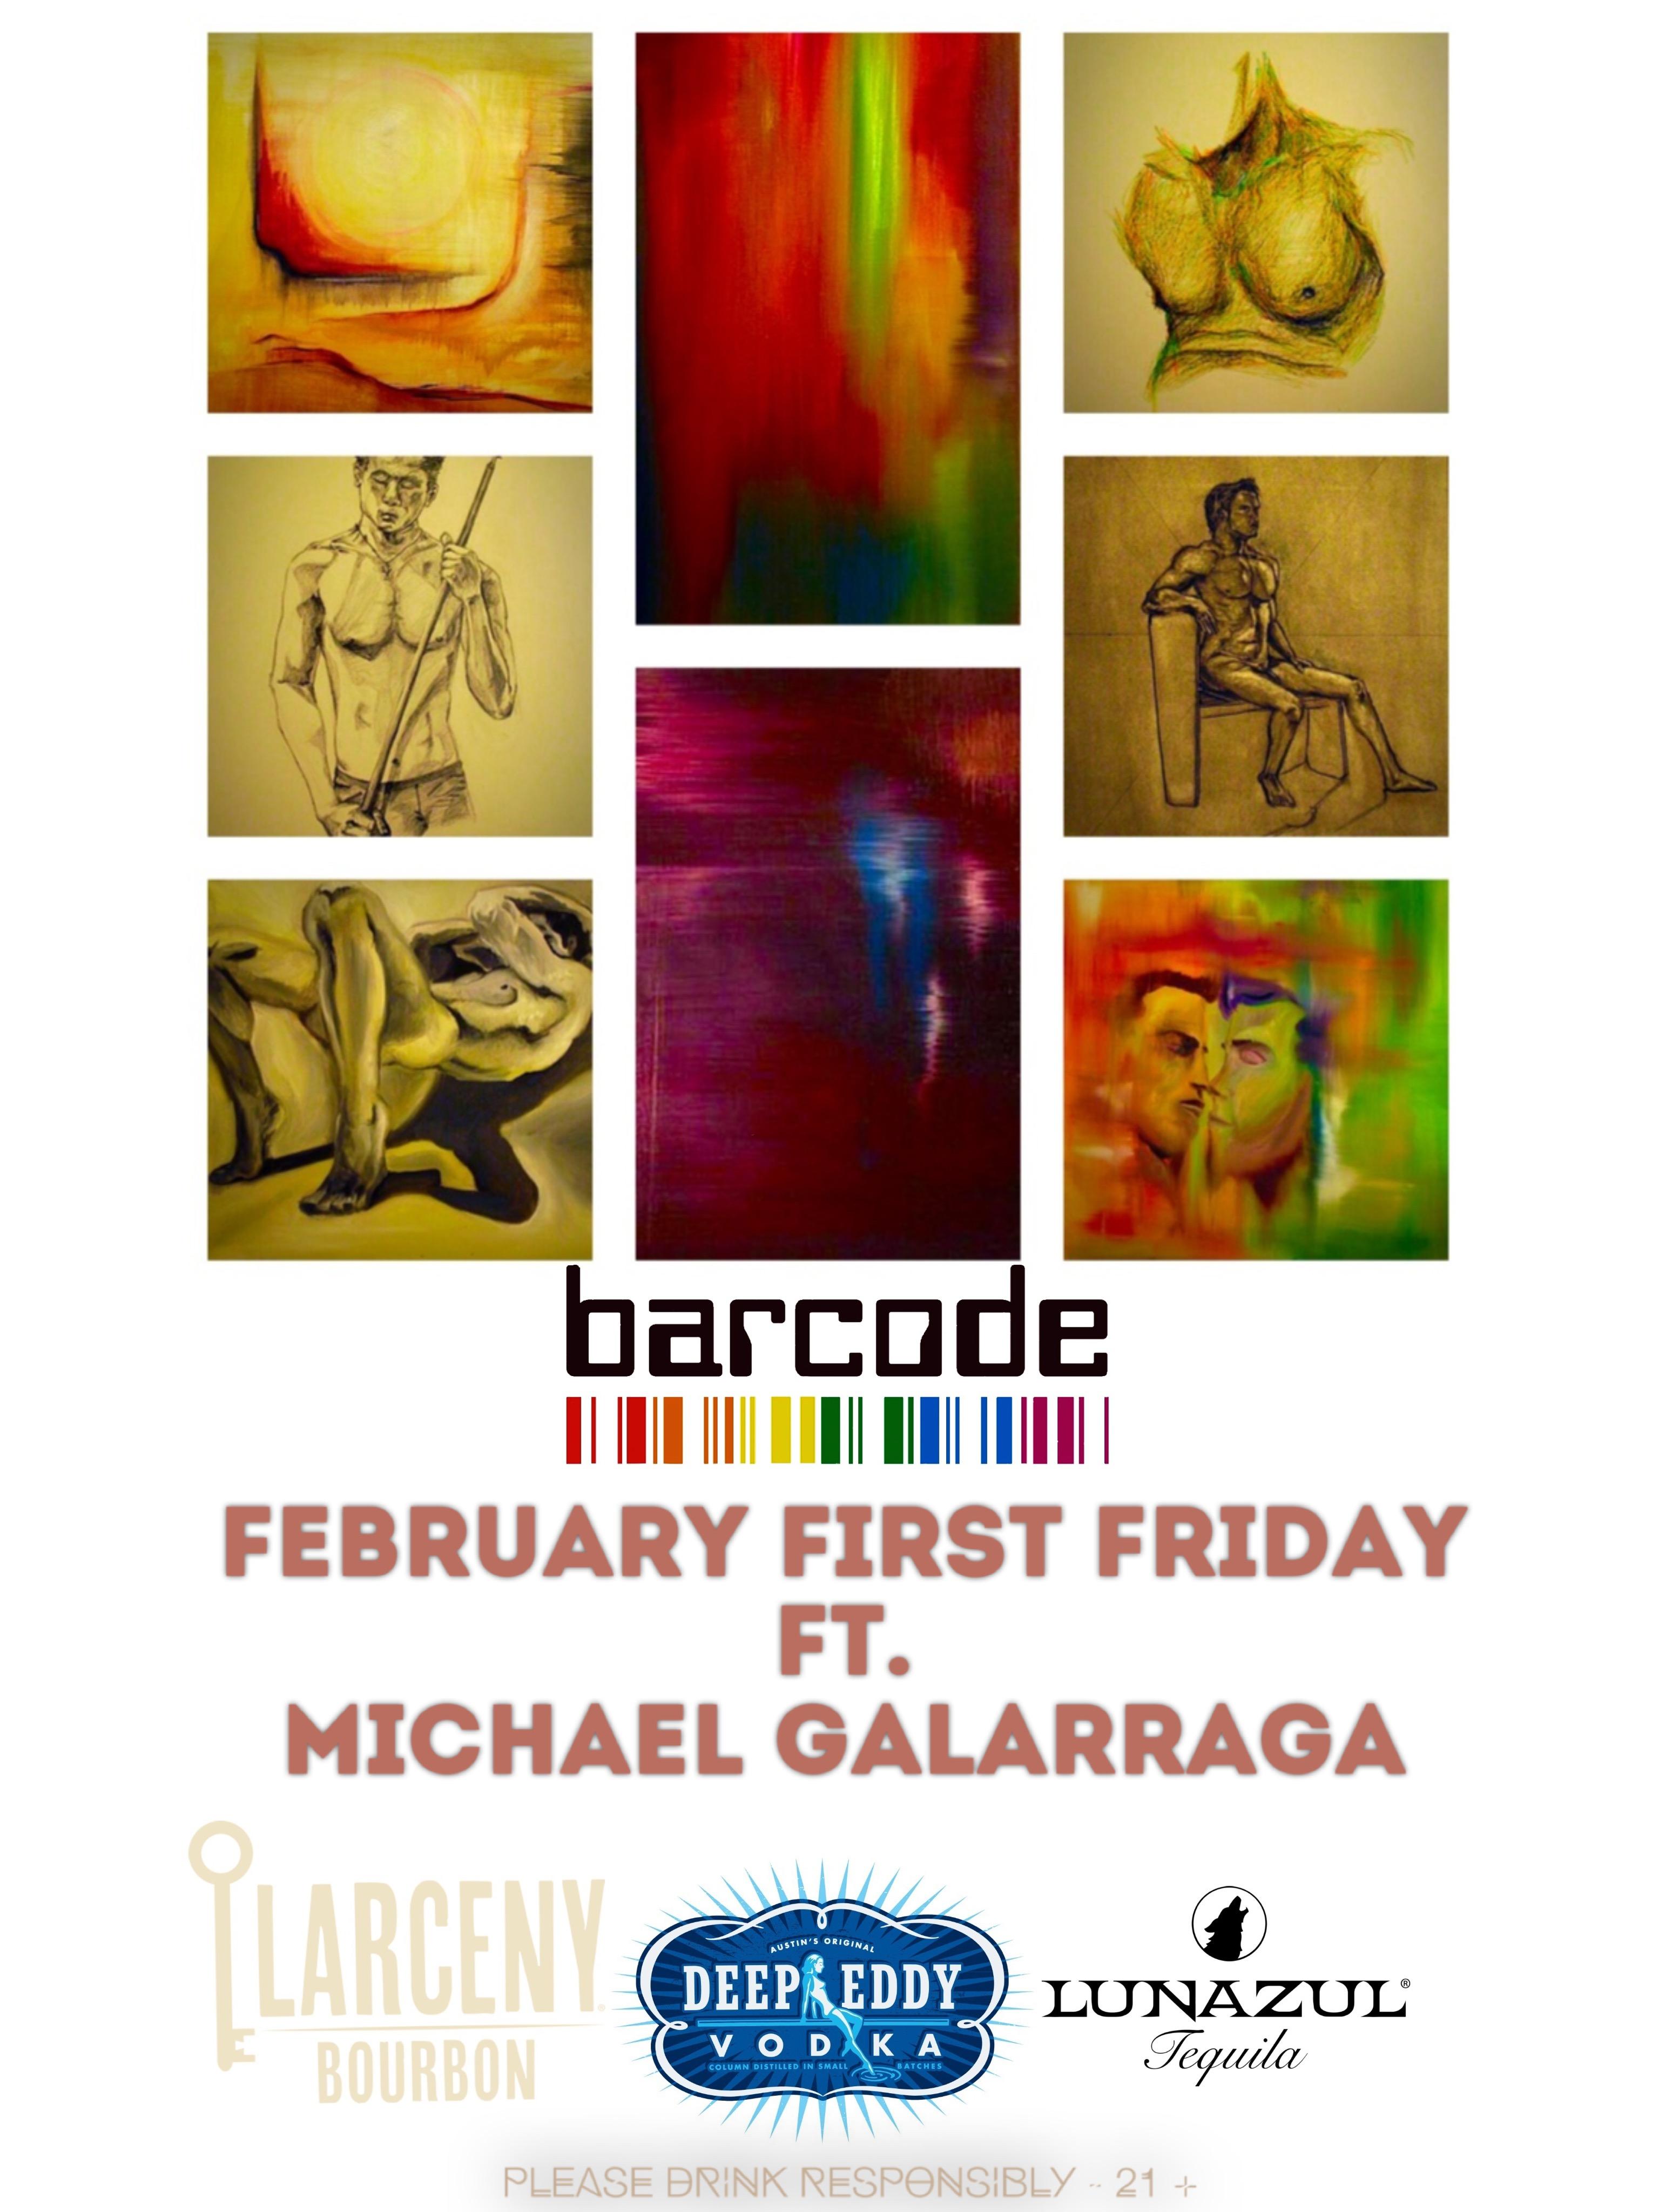 190125-01 - February 2019 Art Show Flyer